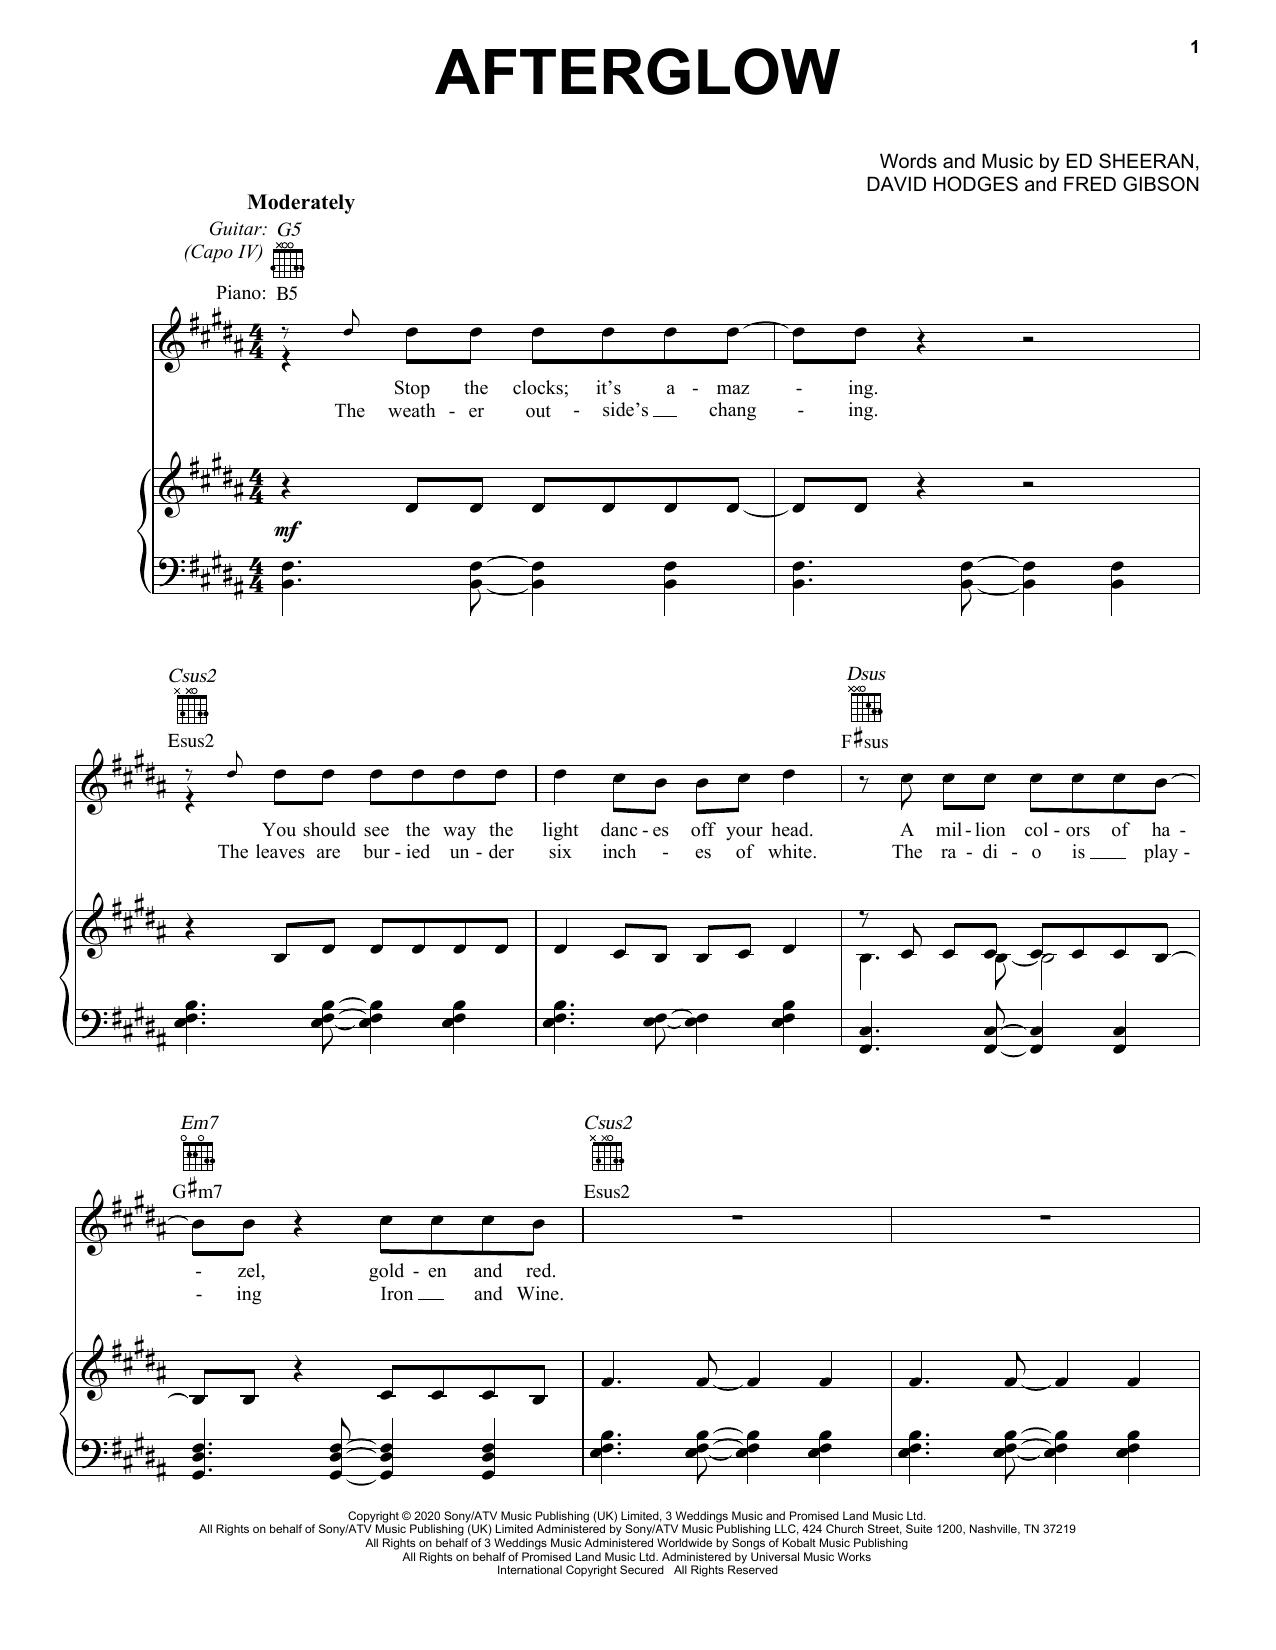 Ed Sheeran Afterglow sheet music notes and chords. Download Printable PDF.